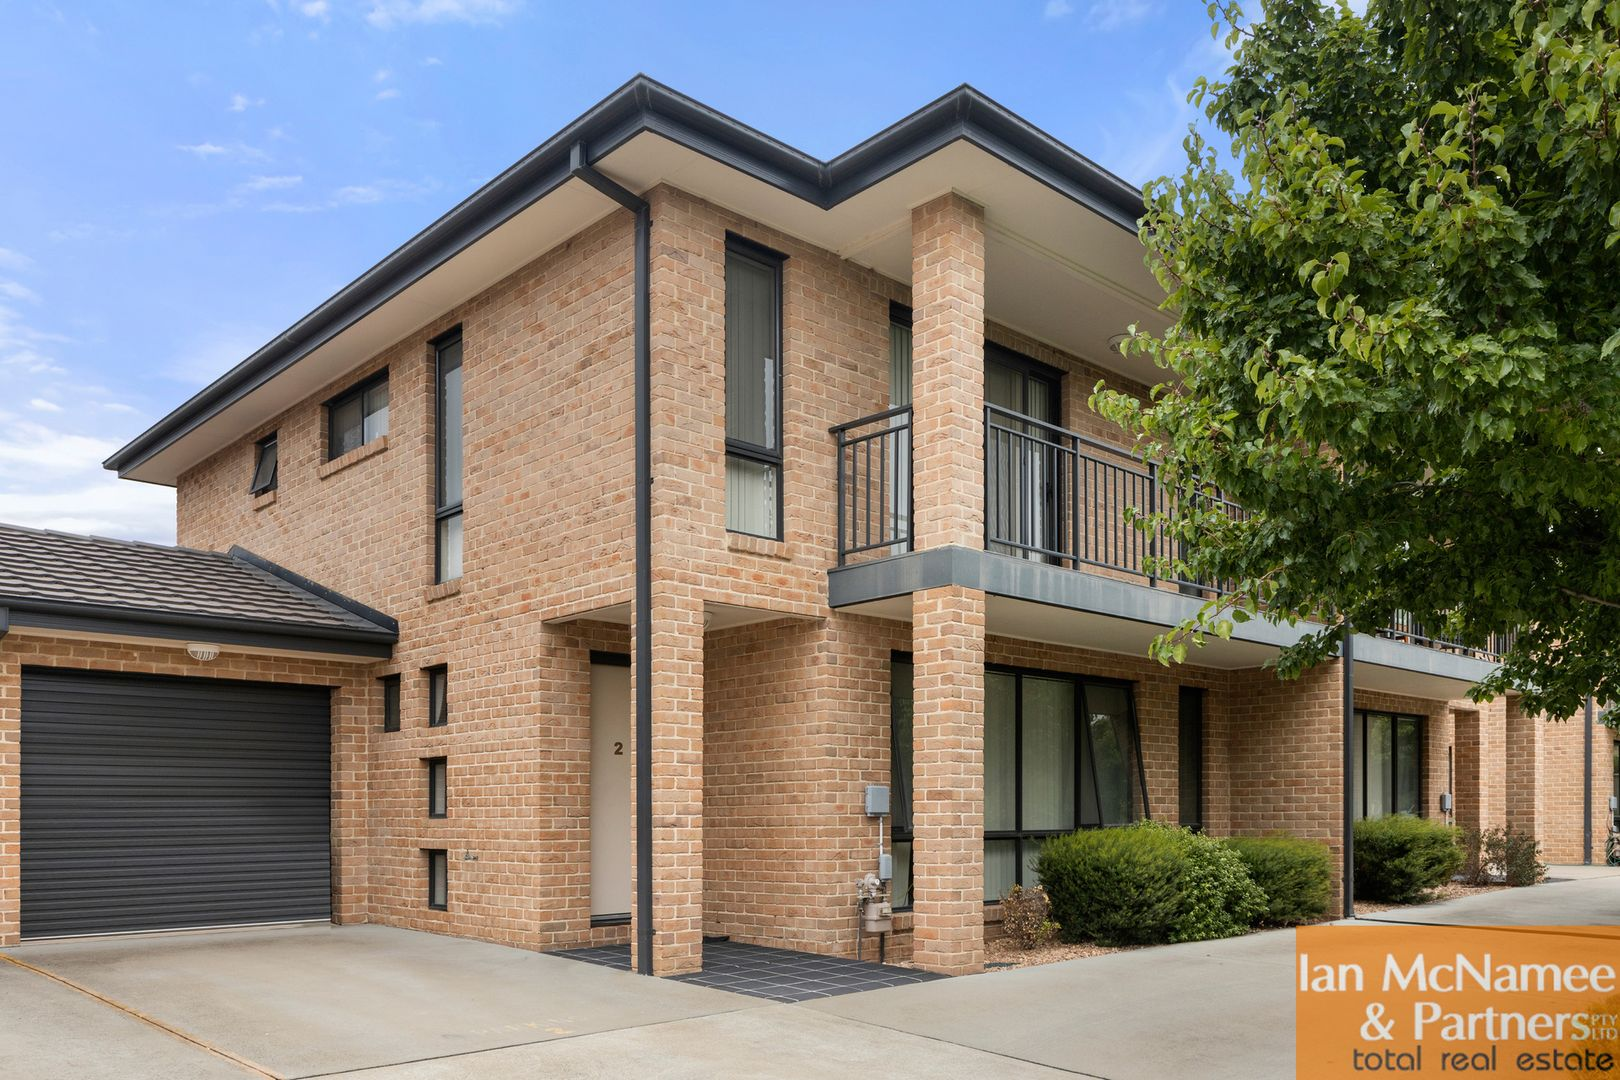 2/20 Mulloon Street, Queanbeyan East NSW 2620, Image 0